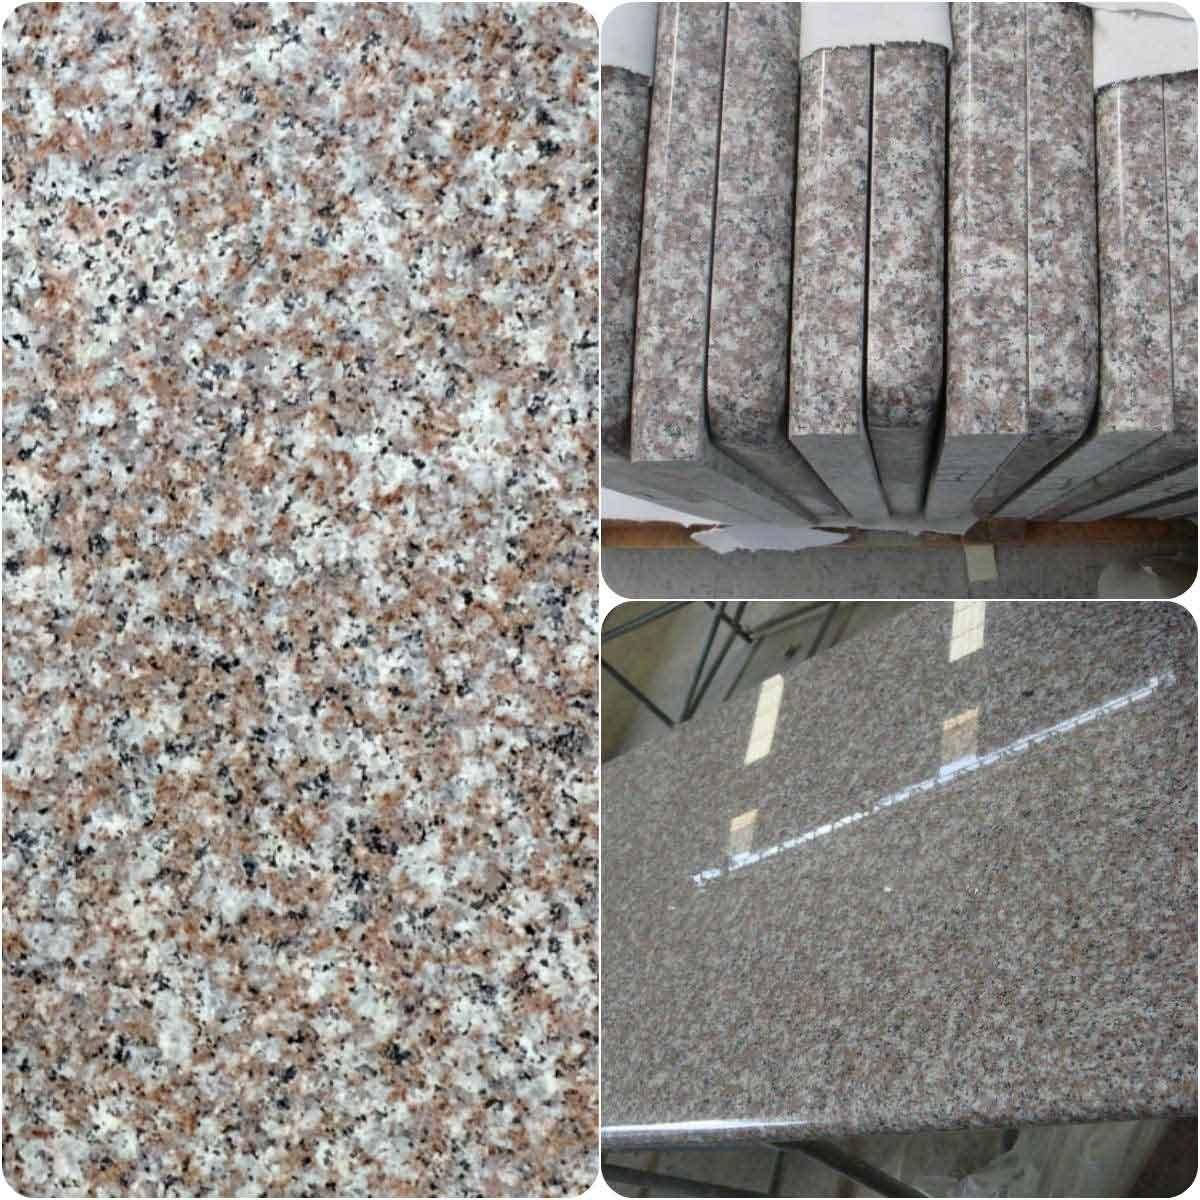 Pink /Gray Chinese Granite G664 Majestic Brown Van